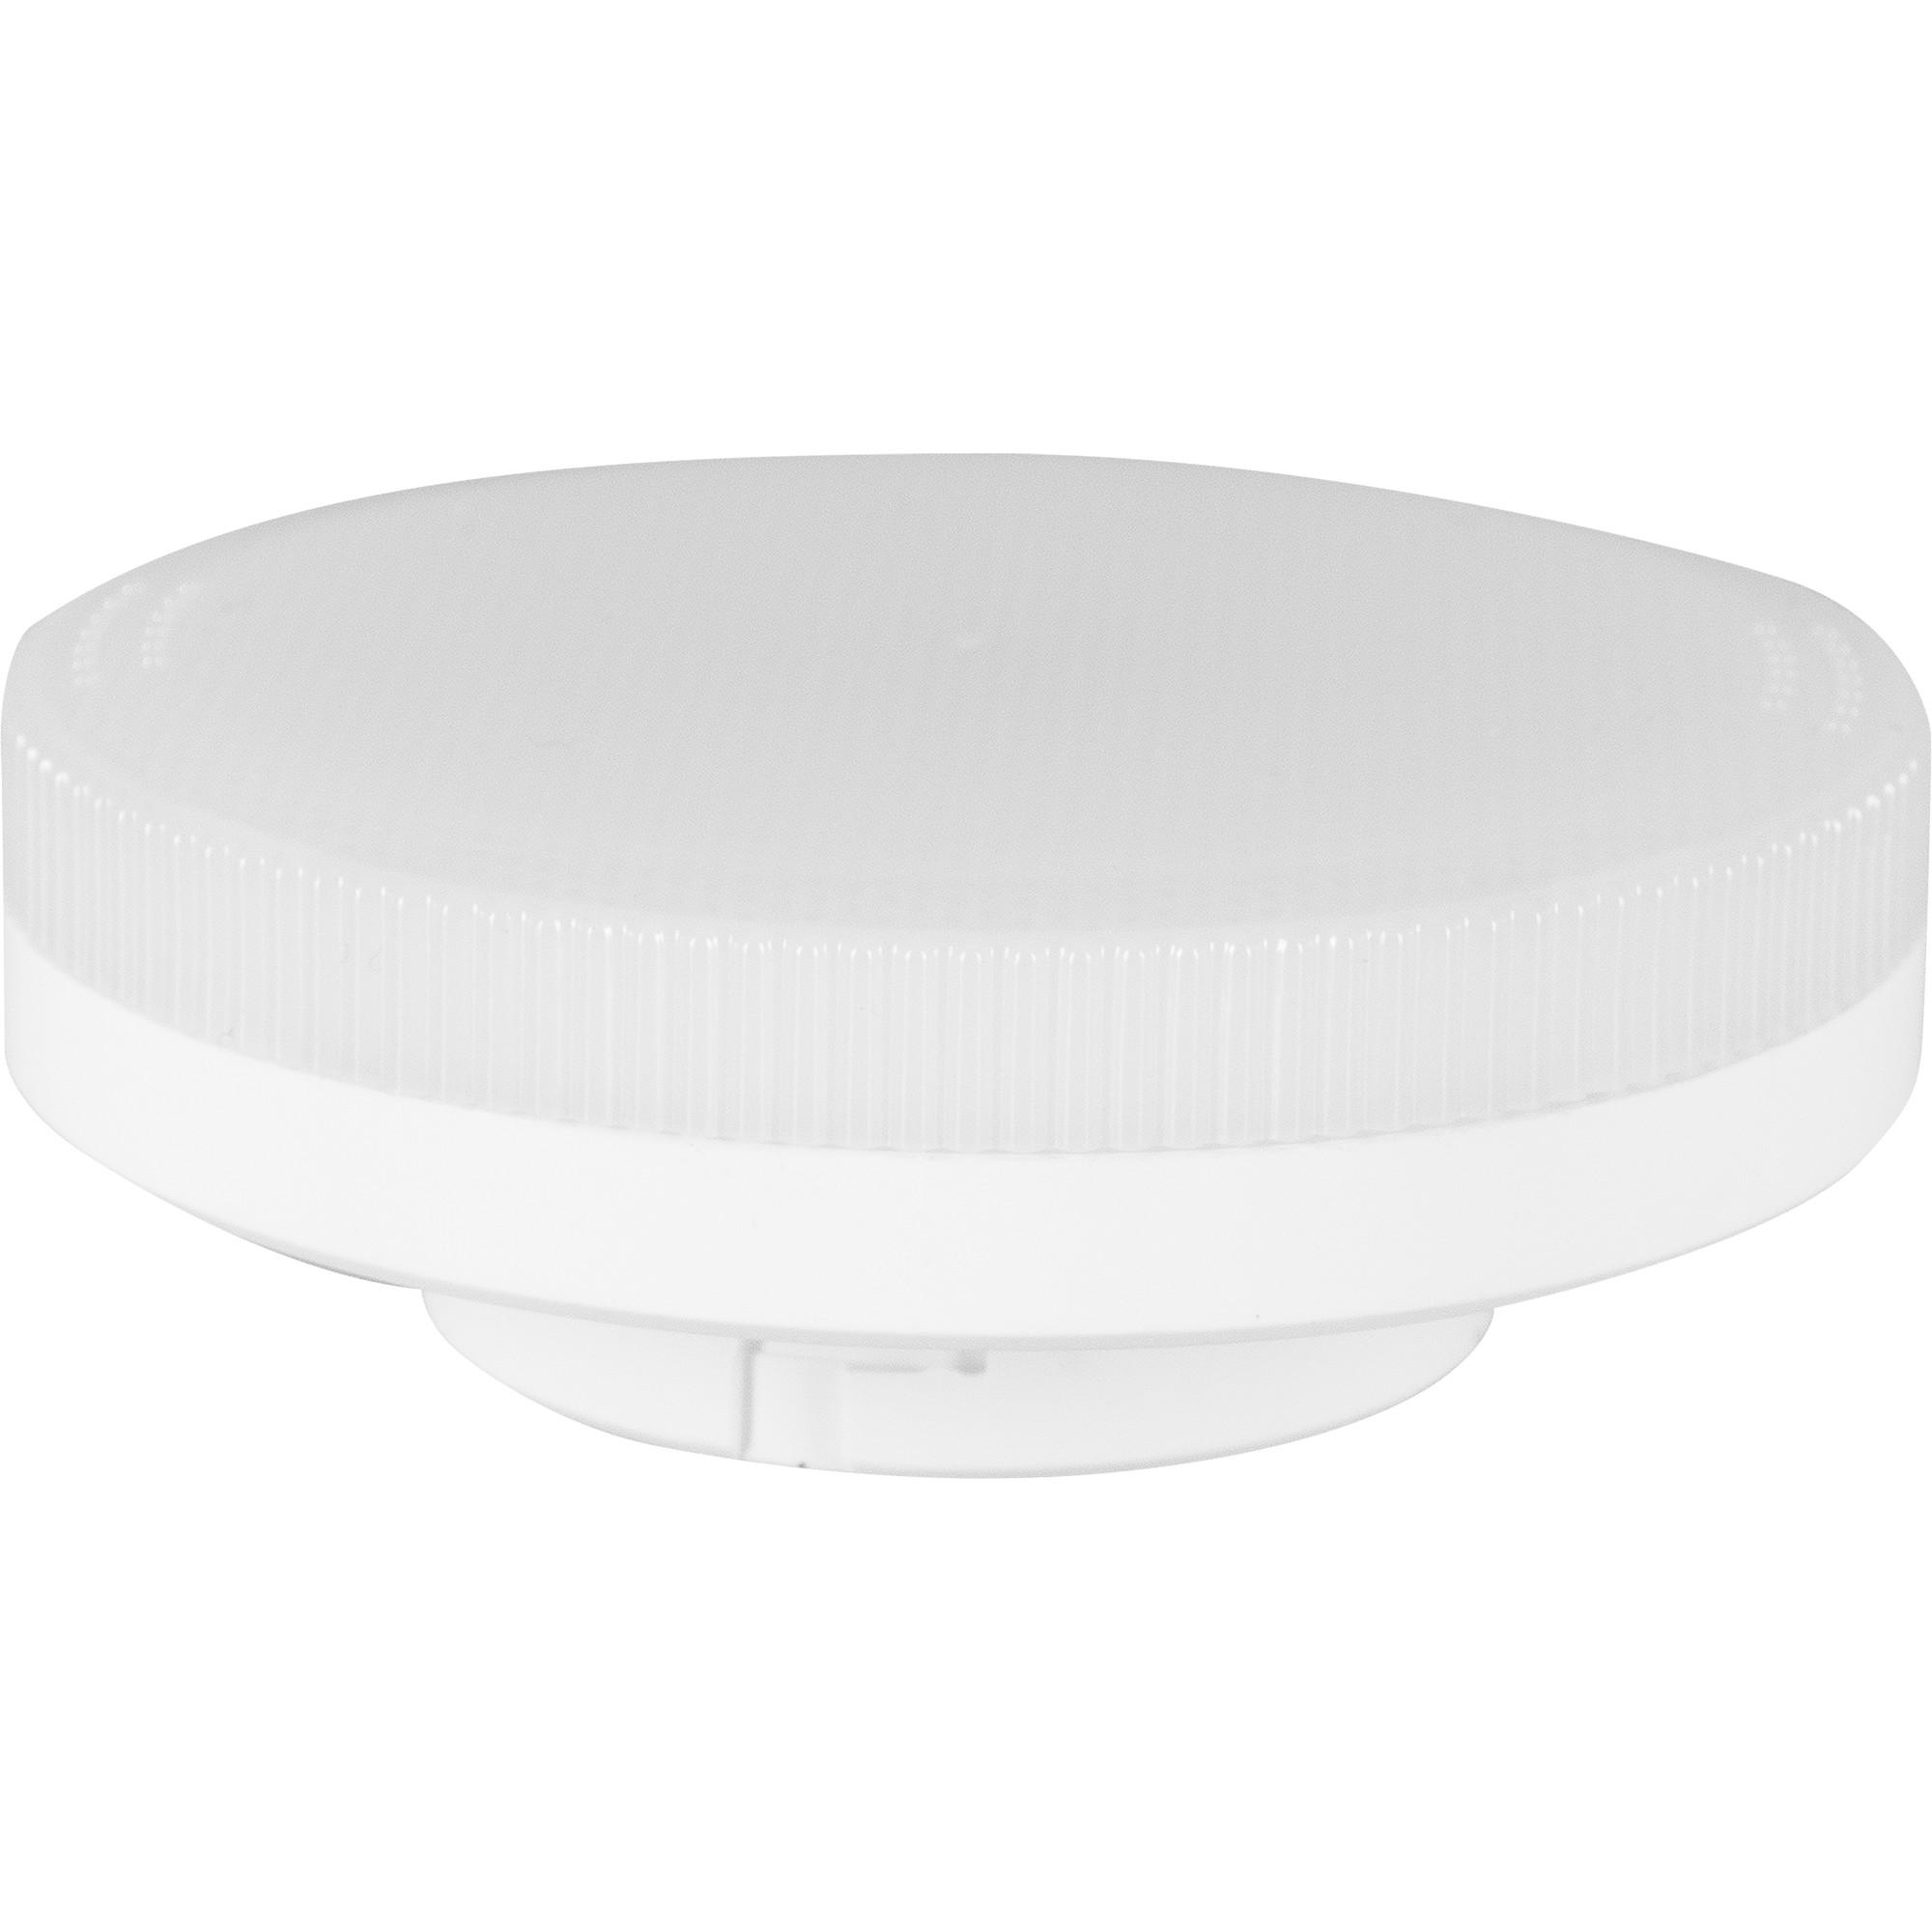 Лампа светодиодная Gauss Basic Gx53 8.5 Вт круг матовый 810 лм тёплый белый свет